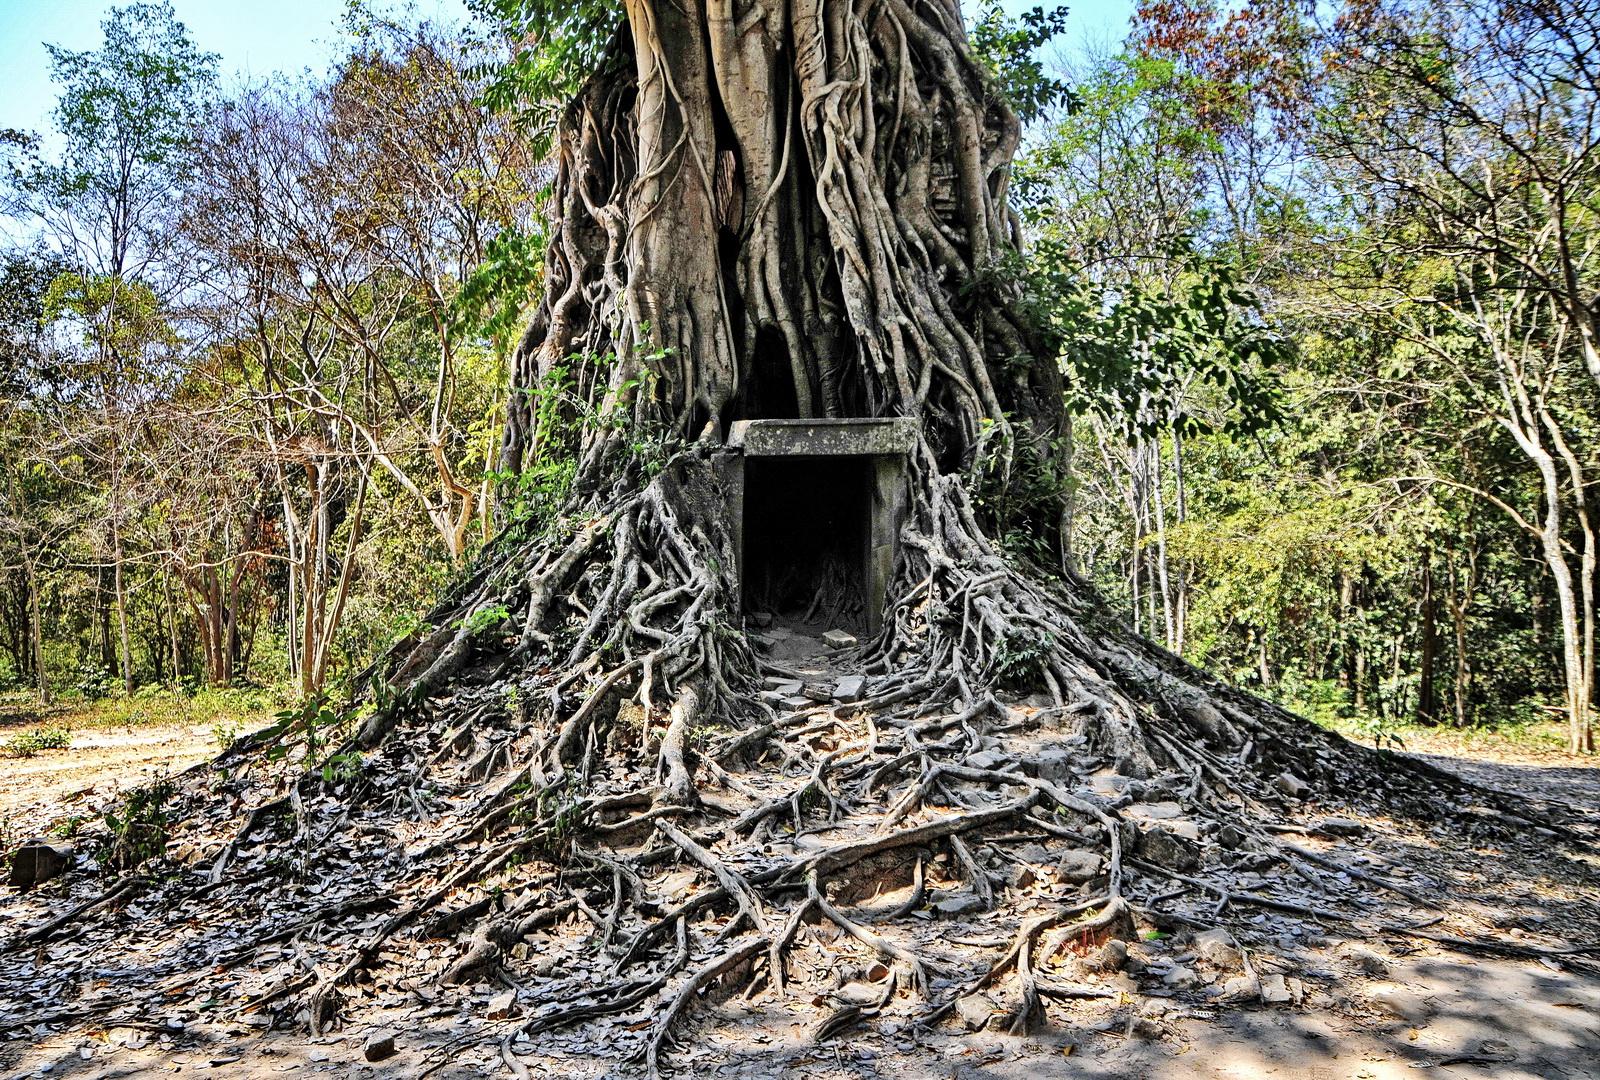 Lesser-known Angkor temples: Sambor Prei Kuk